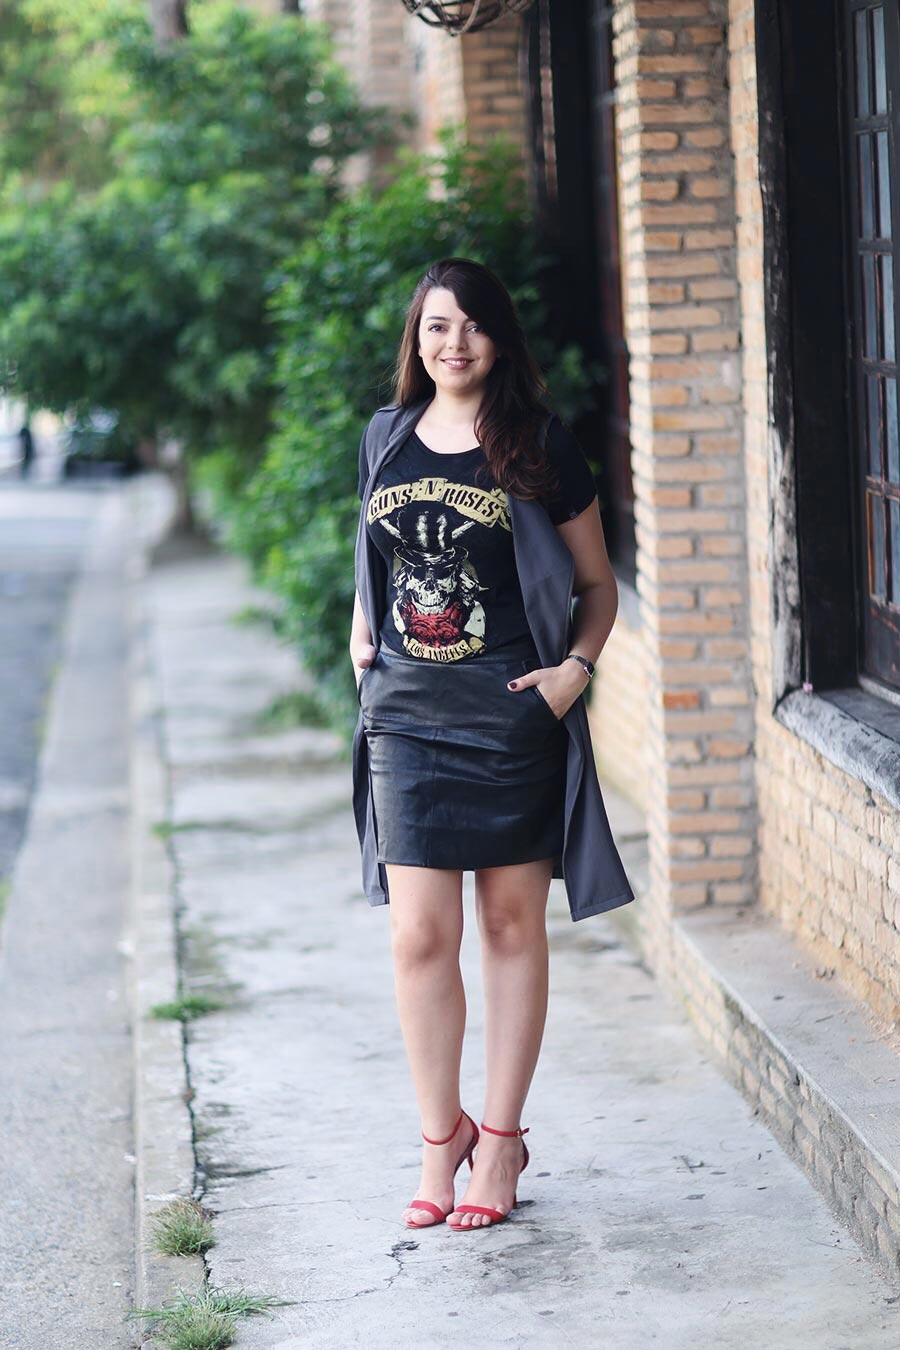 Look do dia: Camiseta de rock com estilo